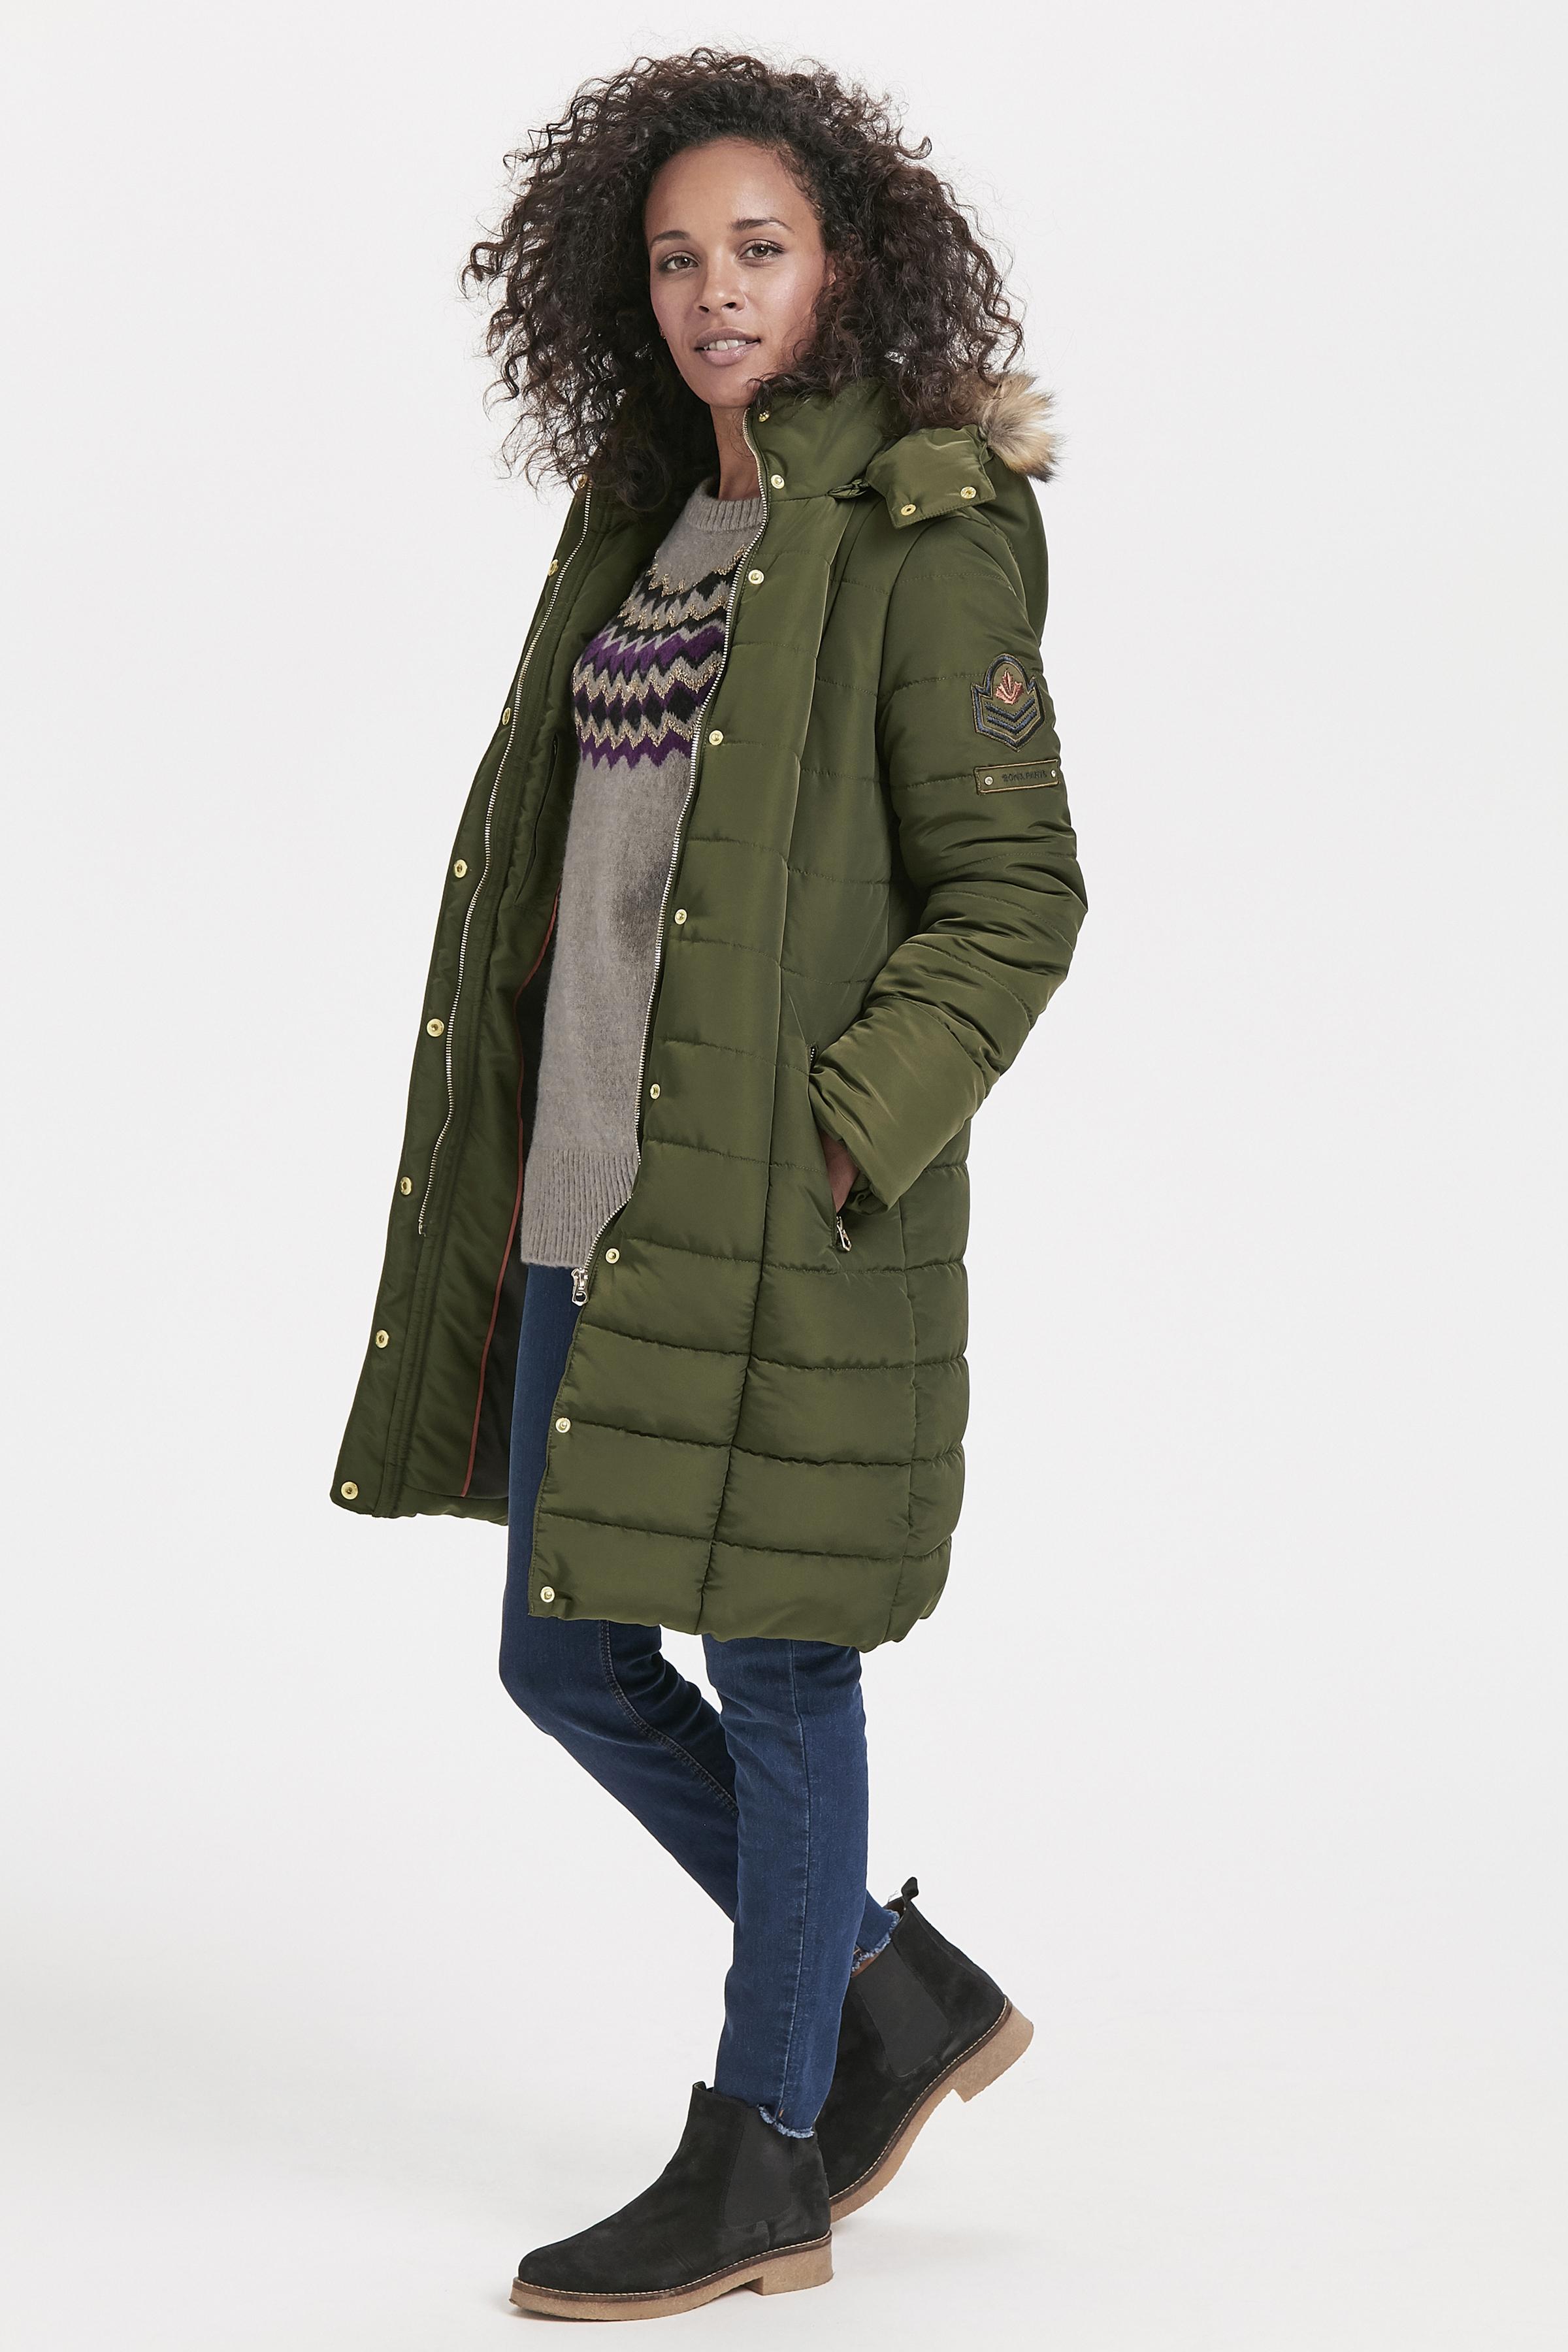 Dunkel olivgrün Jacke von Bon'A Parte – Shoppen Sie Dunkel olivgrün Jacke ab Gr. 36-48 hier